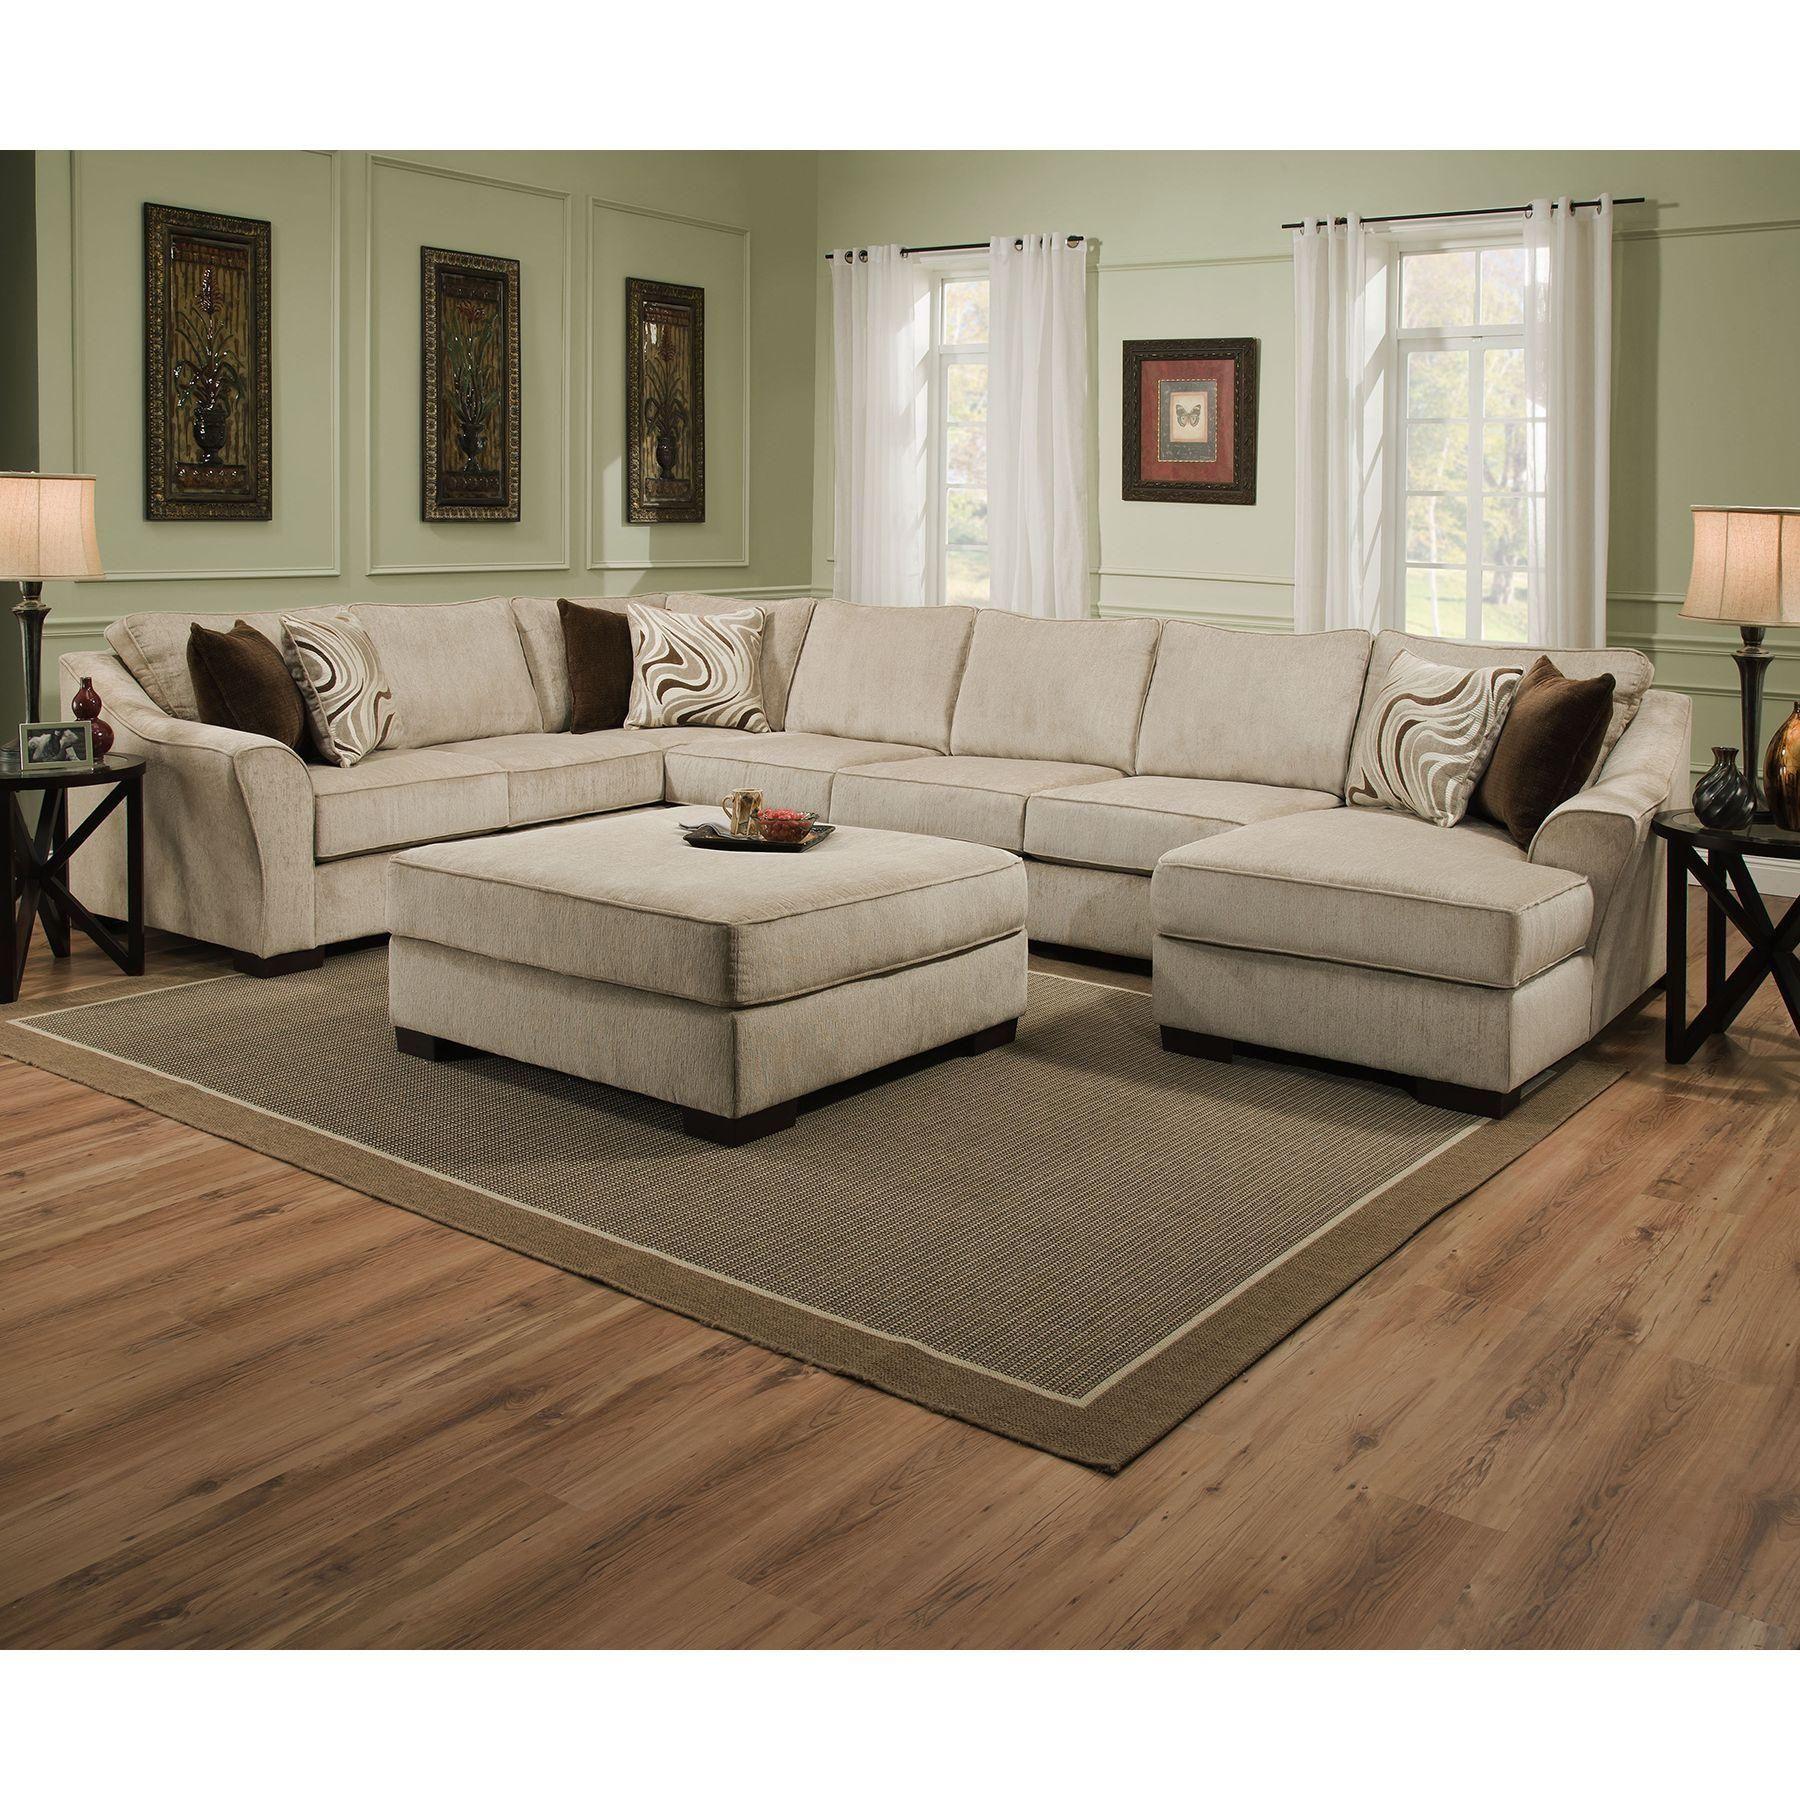 Furniture Comfy Sectional Sofa Living Room Remodel Quality Living Room Furniture Sectional Sofa Comfy